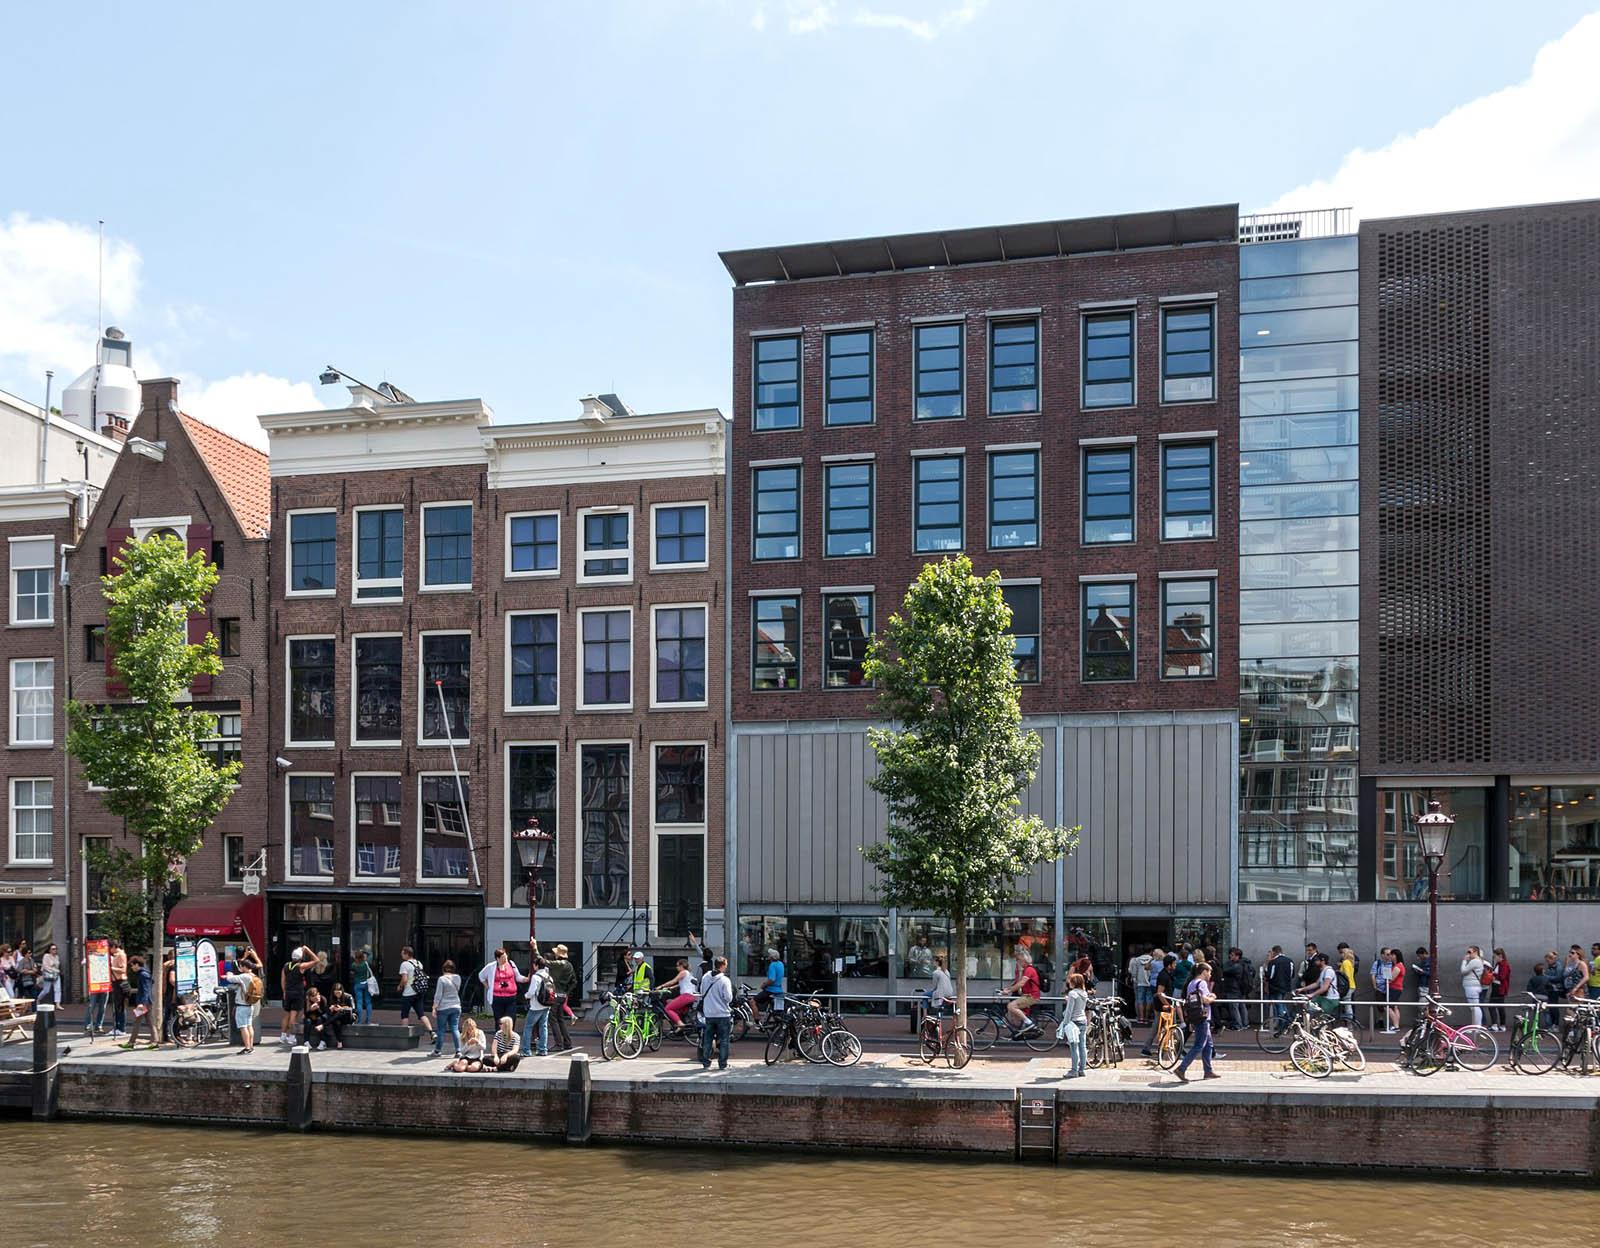 2048px-Amsterdam_%28NL%29__Anne-Frank-Huis_--_2015_--_7185.jpg?1537459809